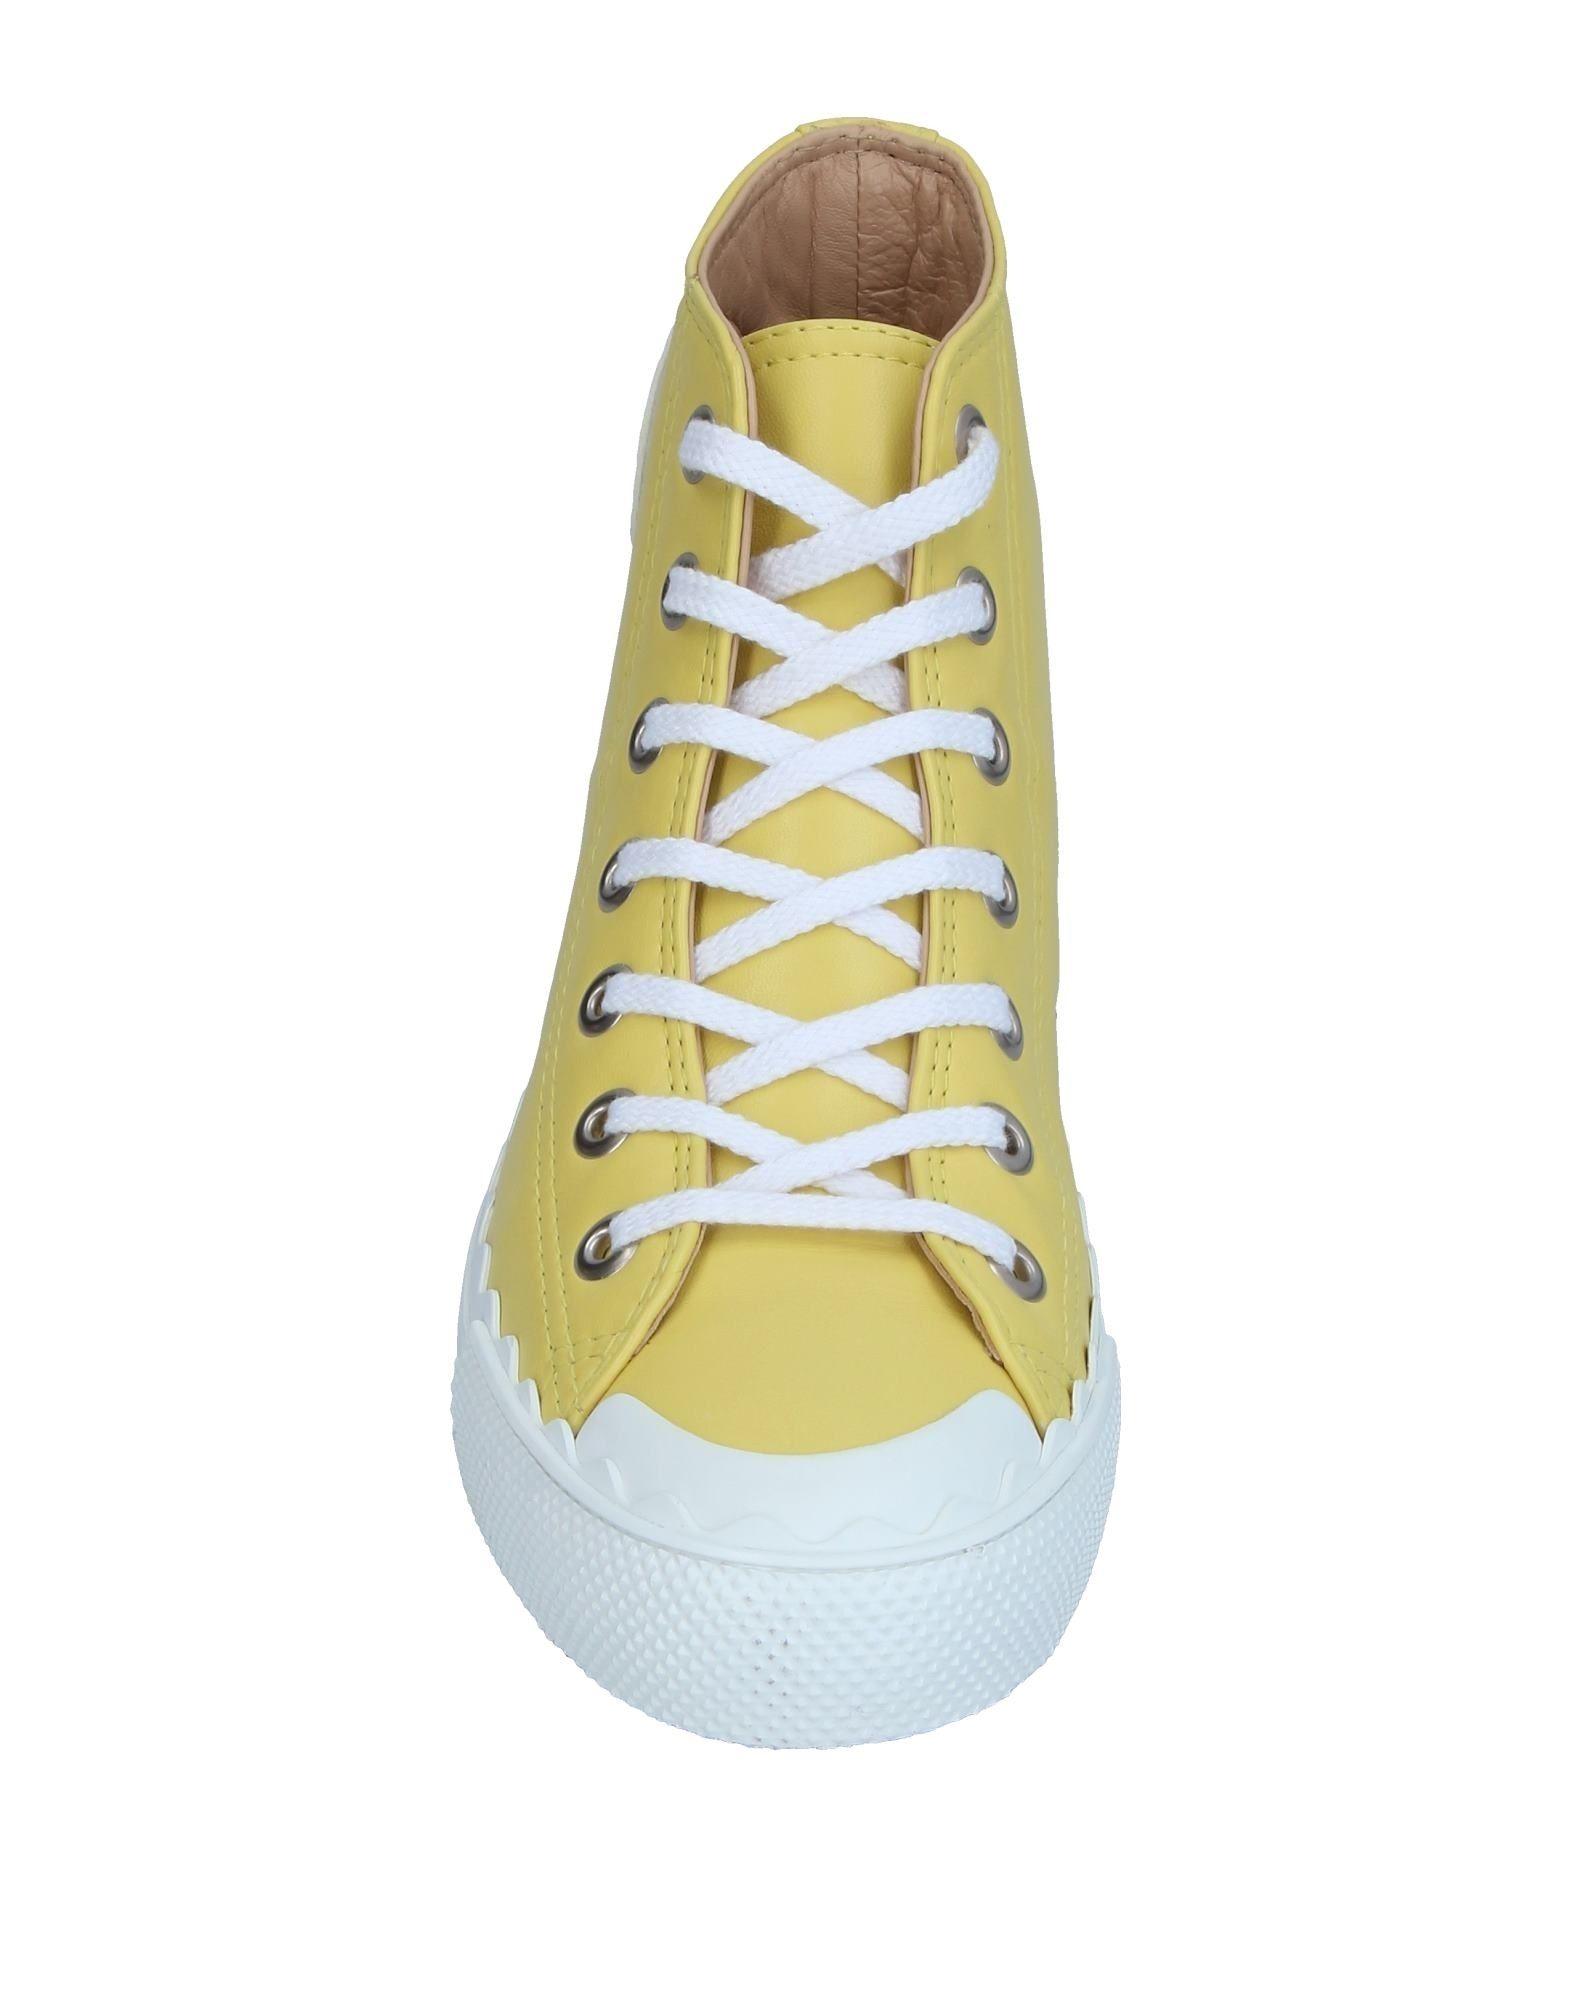 Chloé Sneakers Schuhe Damen  11341161XMGut aussehende strapazierfähige Schuhe Sneakers b1c3d2